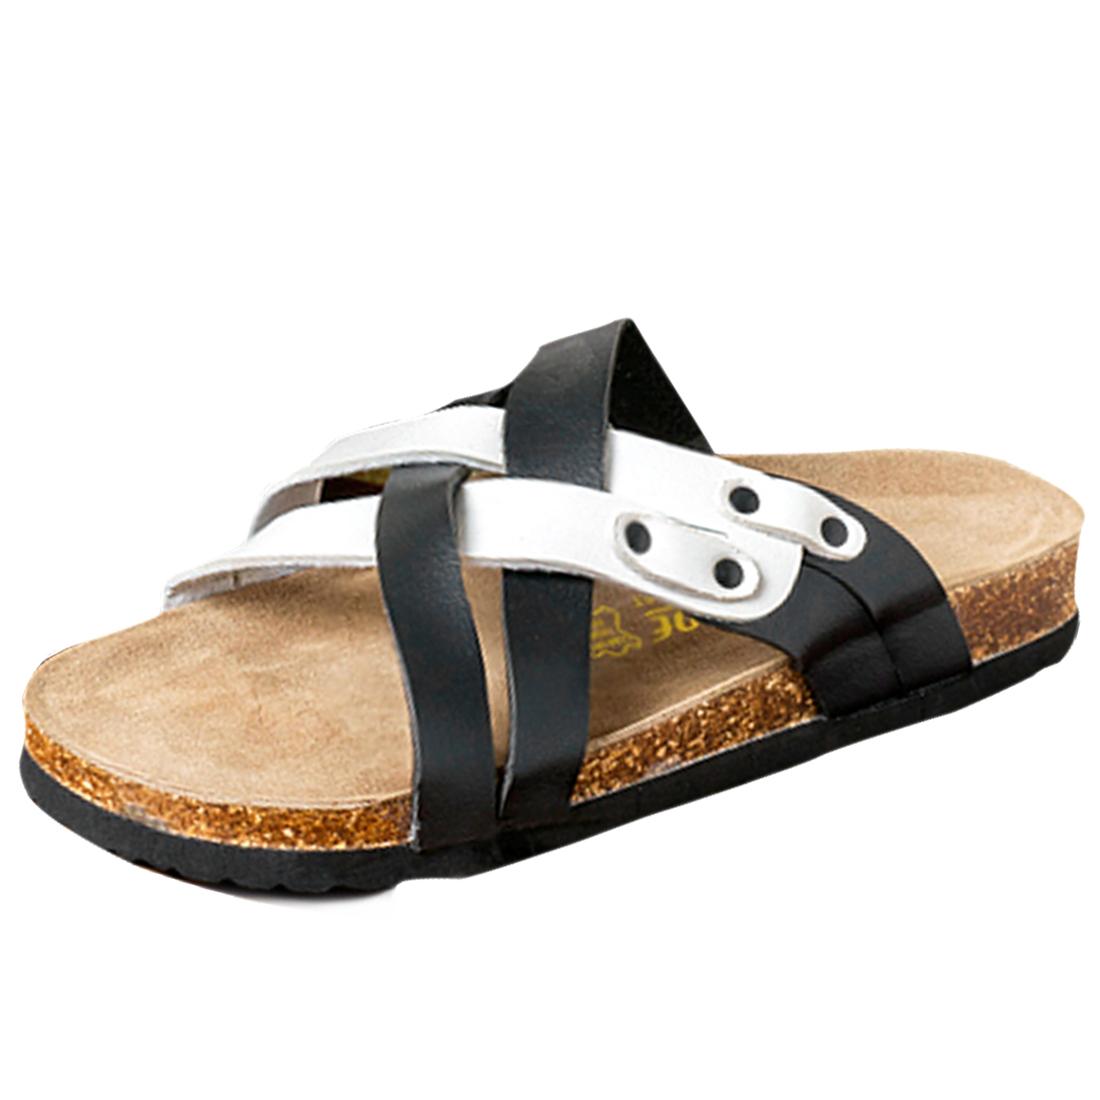 Mens Summer New Leisure Black White Cross Strap Sandals US 8